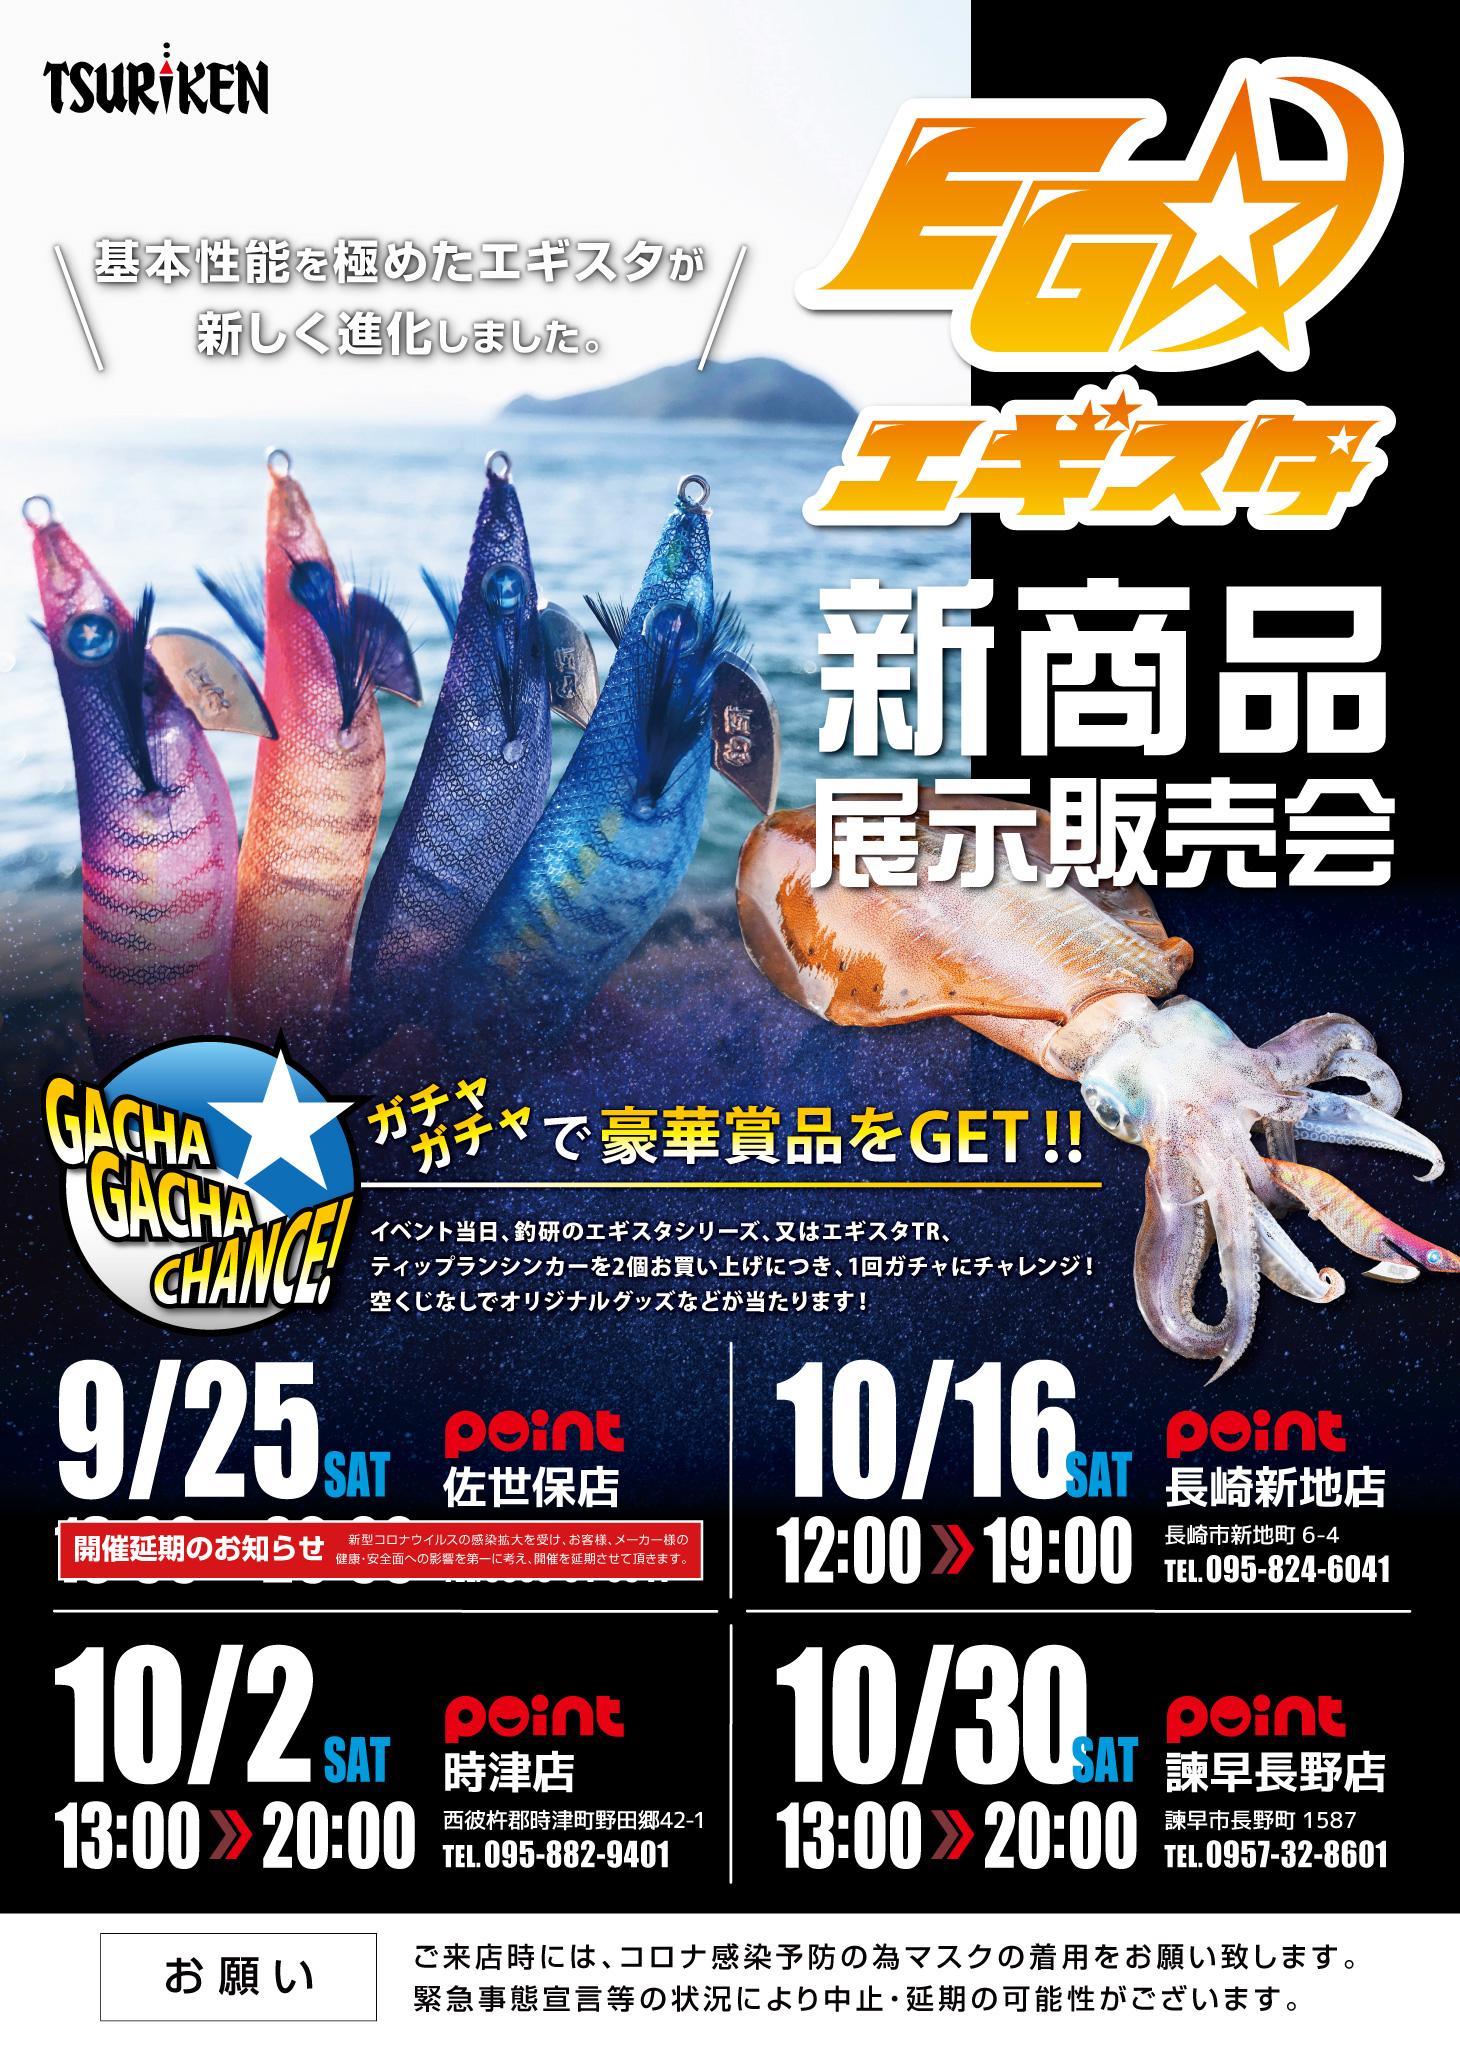 【佐世保店 開催延期】エギスタ新商品展示販売会2021 長崎エリア 1